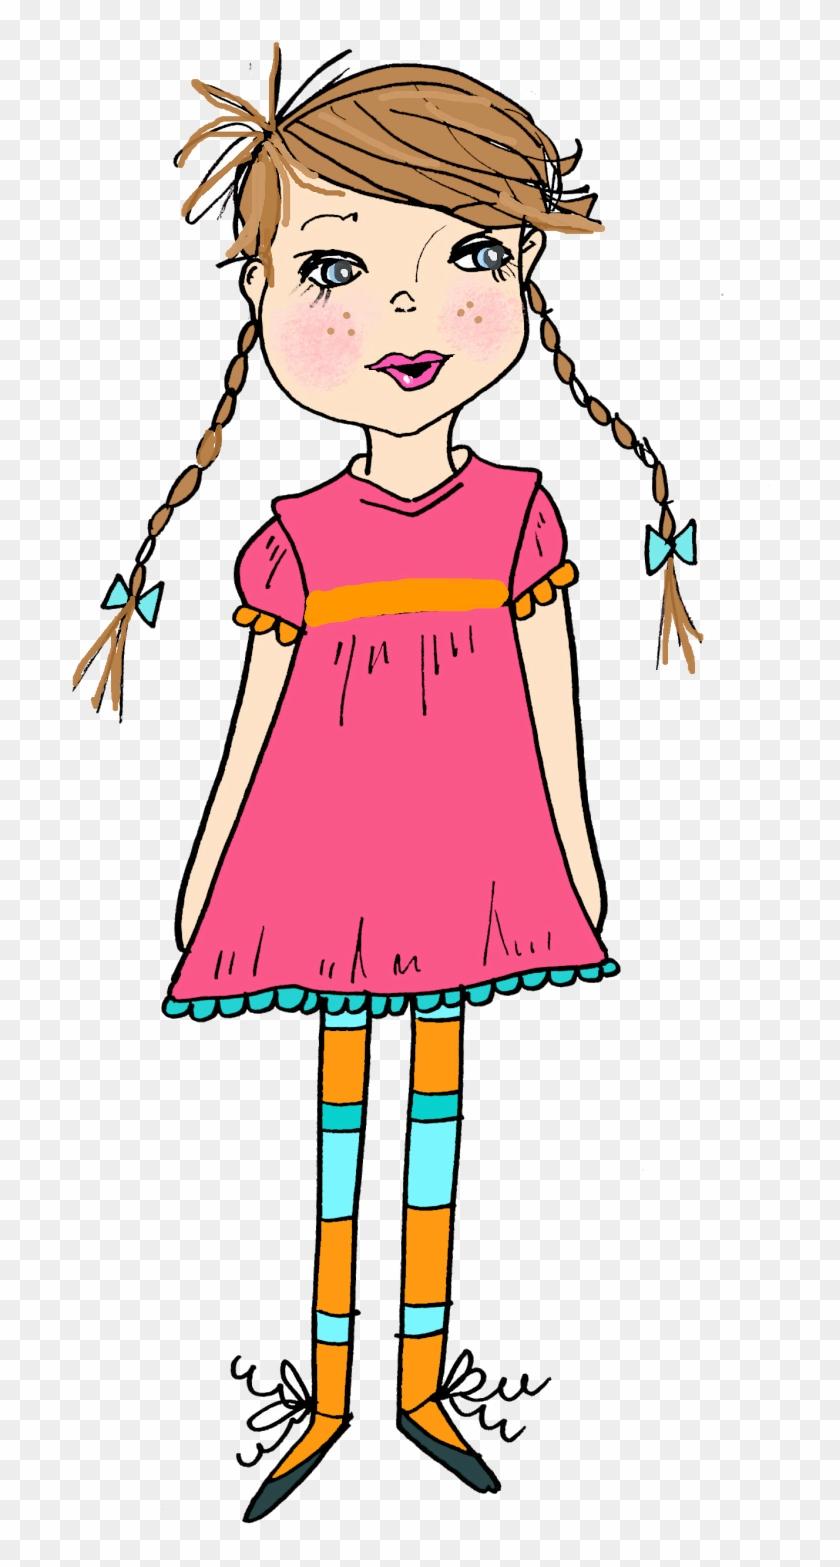 Little Girl Clipart Thinking - Little Girl Clipart ... banner freeuse library